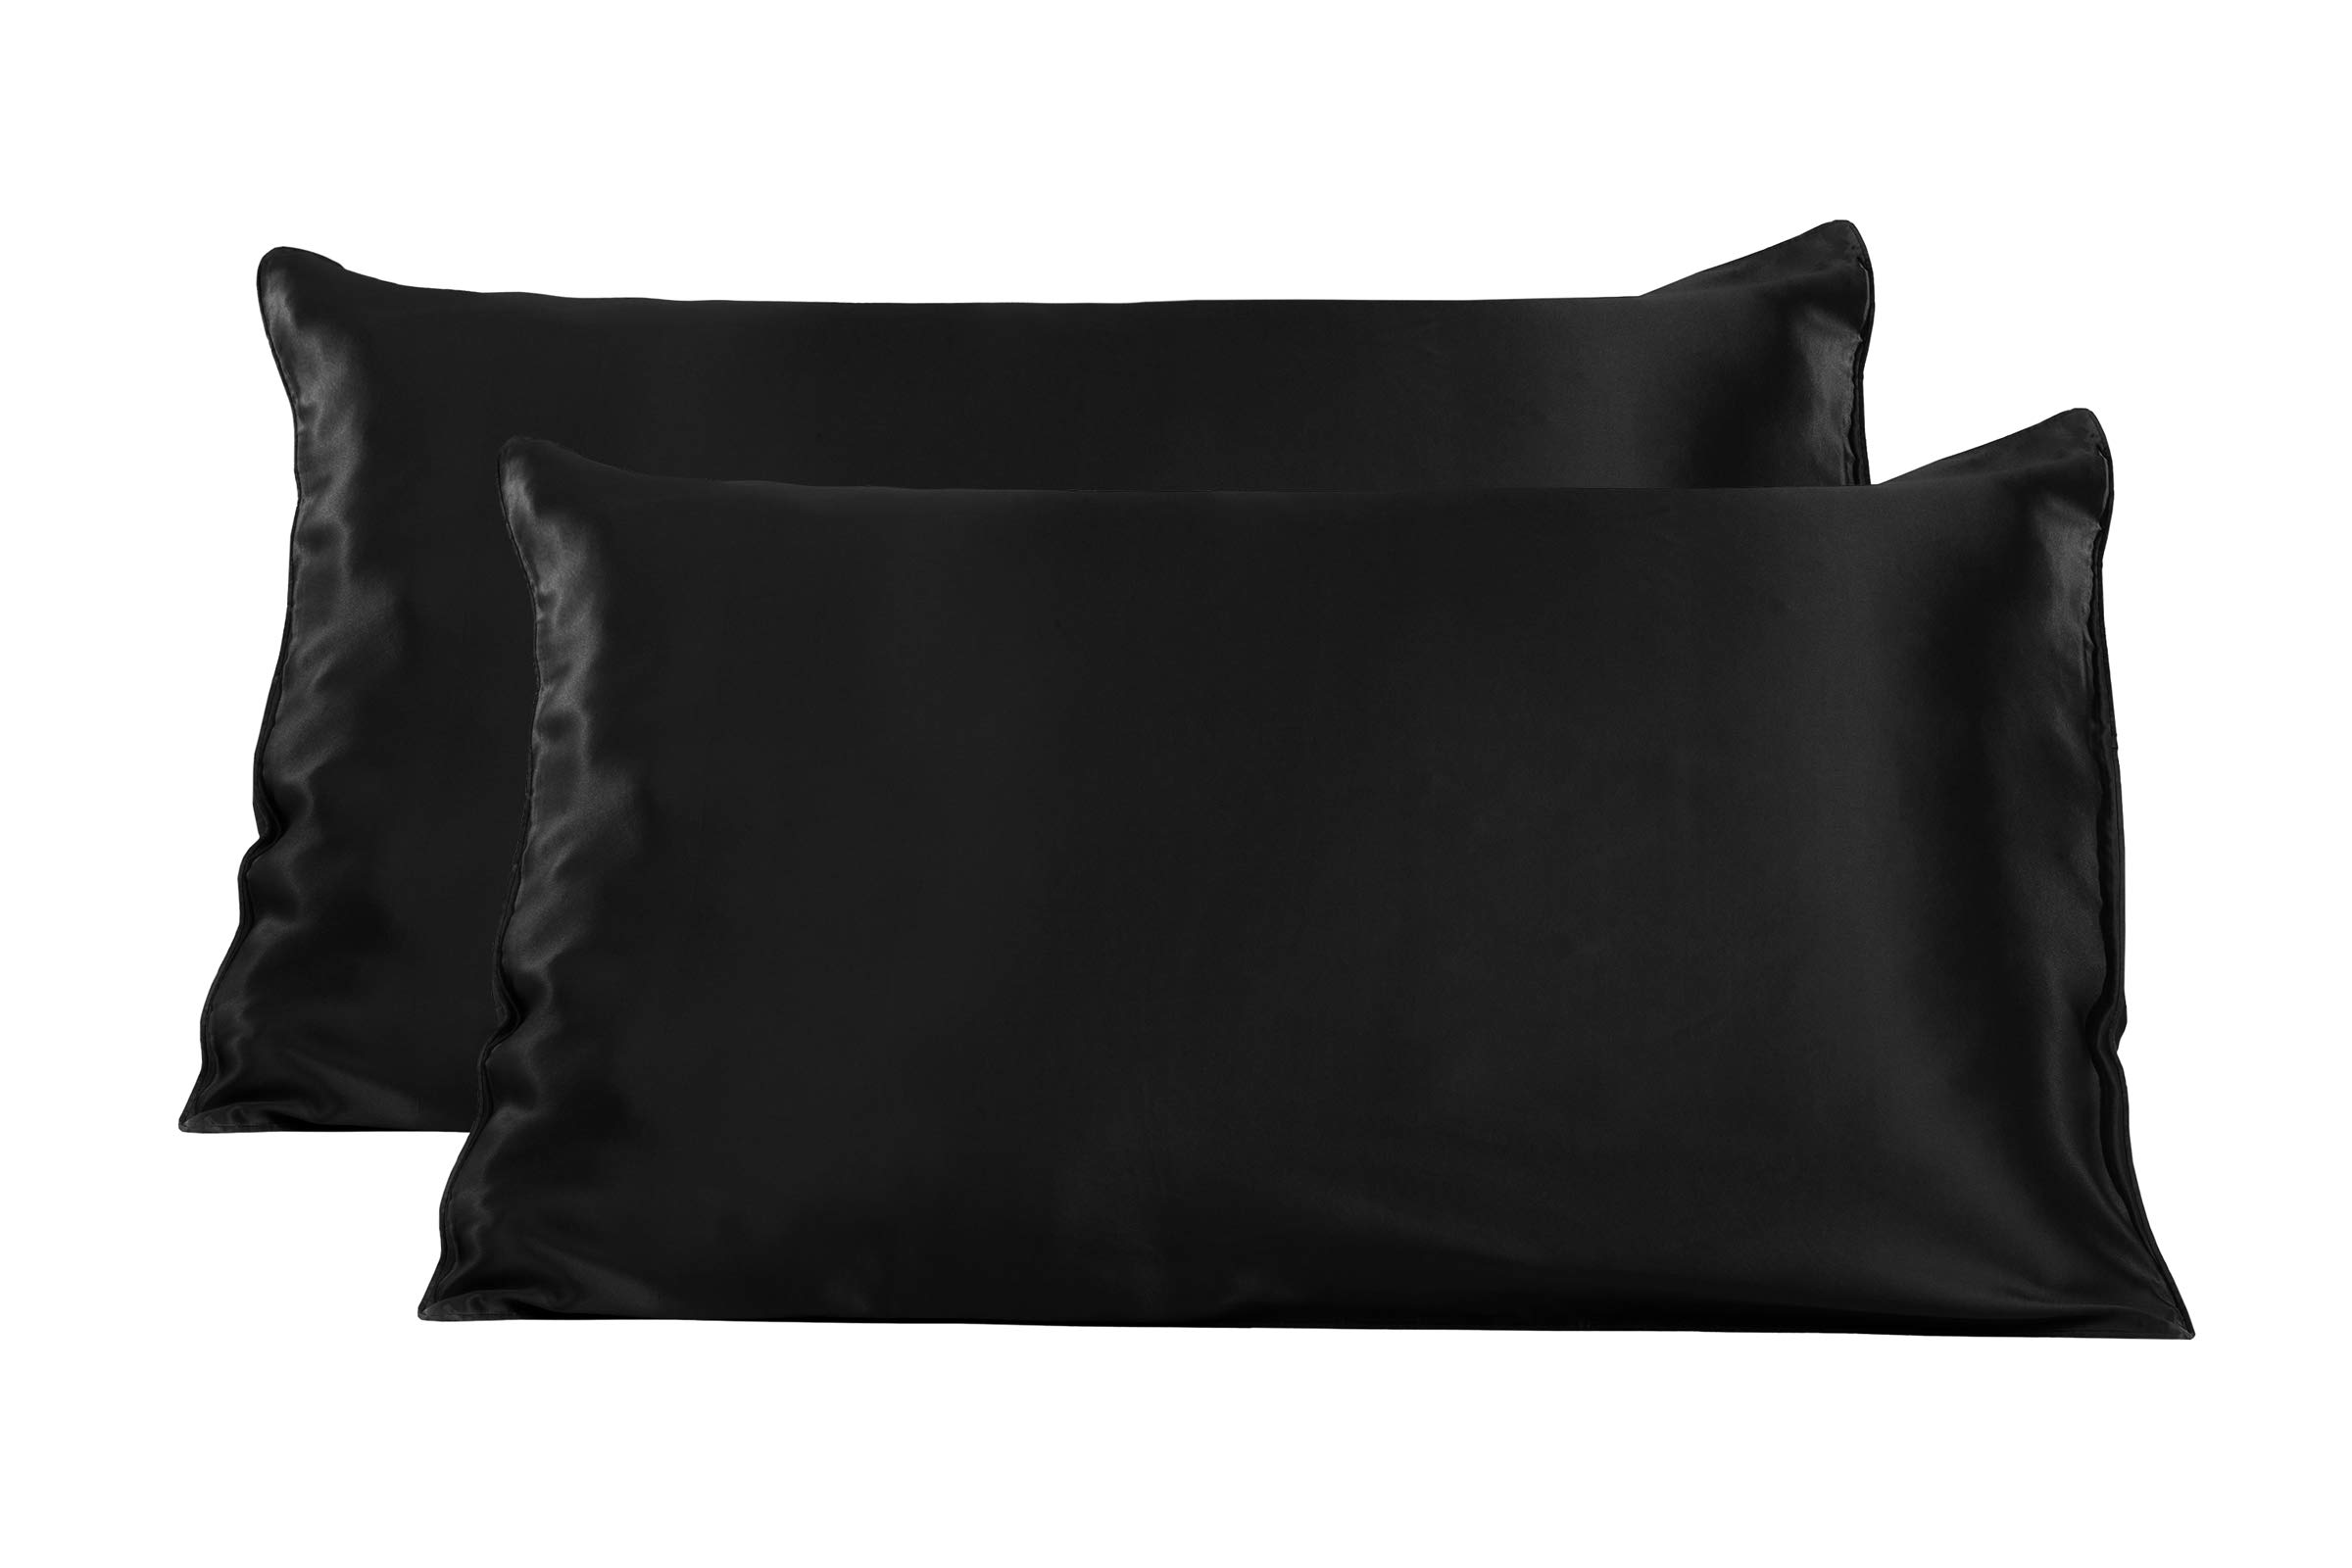 TexereSilk Mulberry Silk Pillowcase (2-Pack, Black 2 PK, Q) Luxury Pillowcases